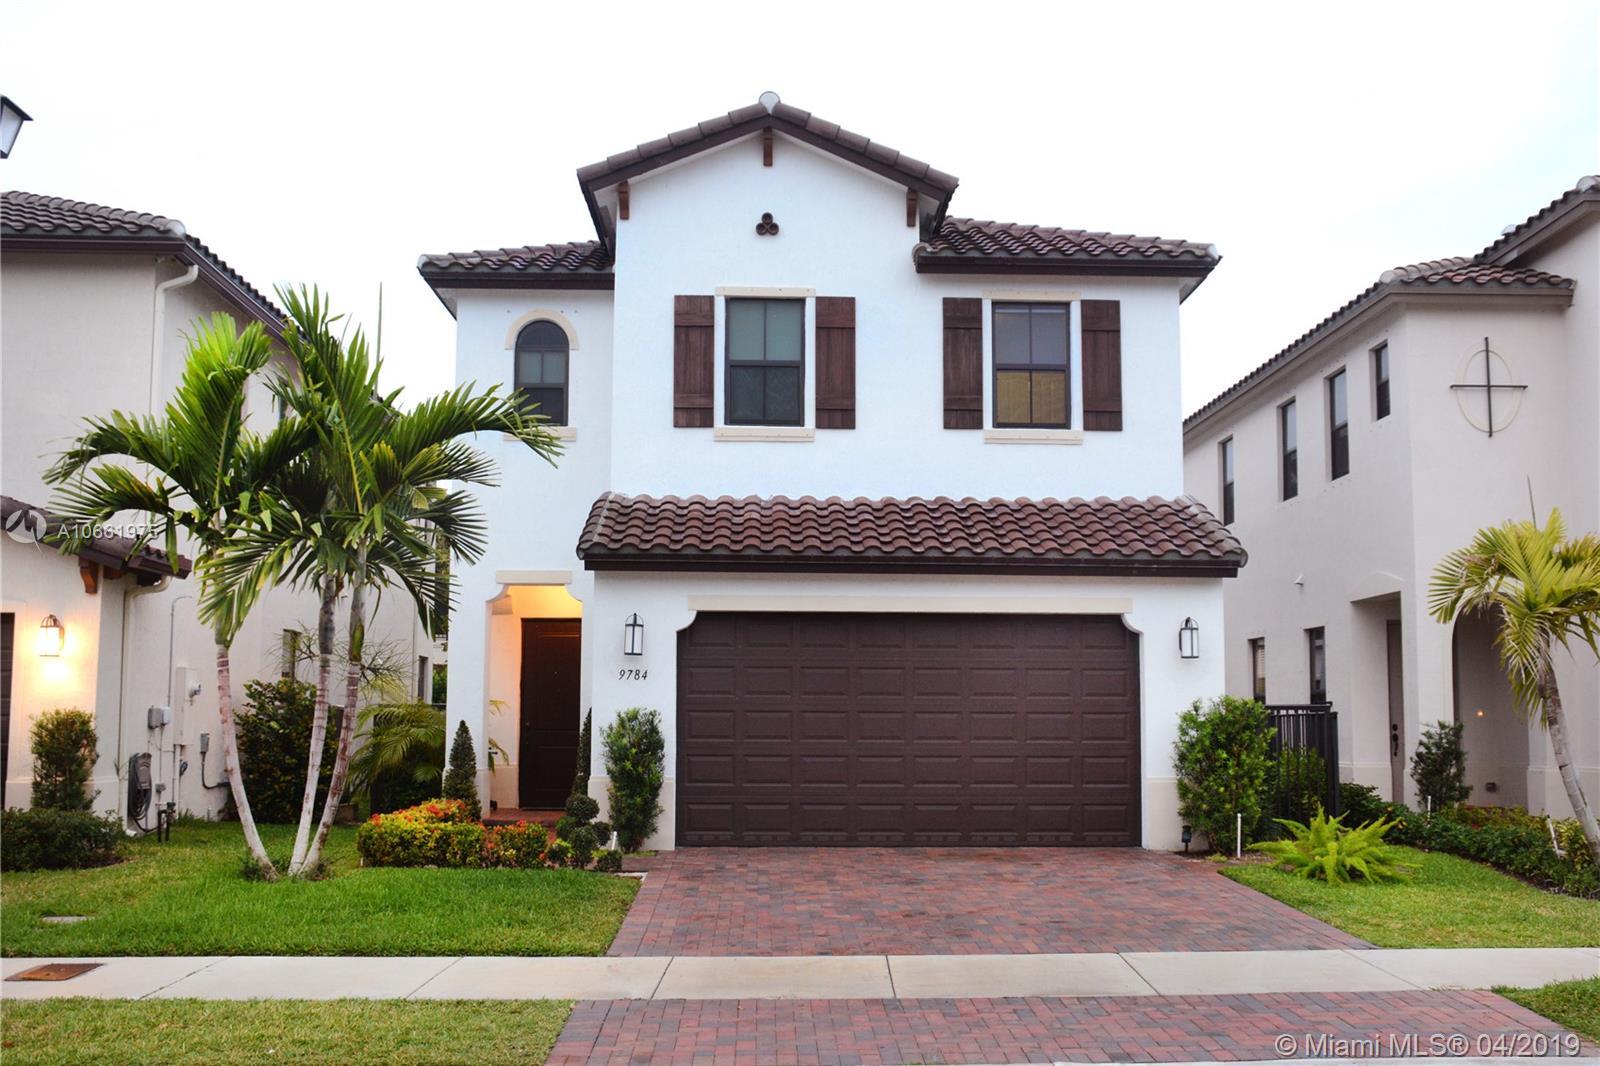 9784 W 34th Ct - Hialeah, Florida